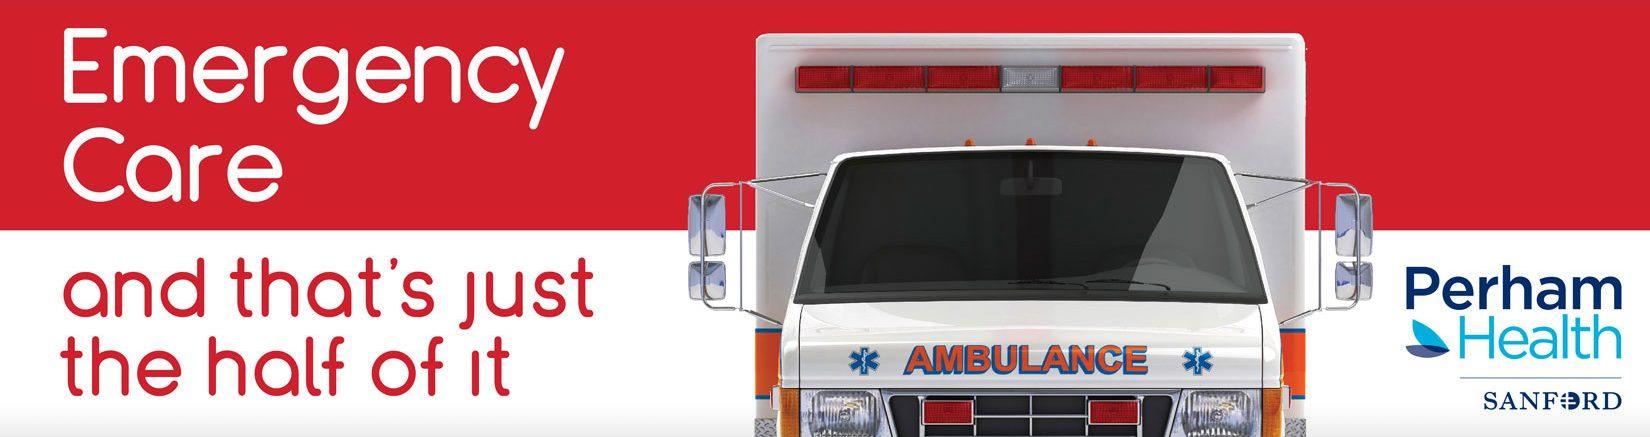 Sanford Perham Health emergency care